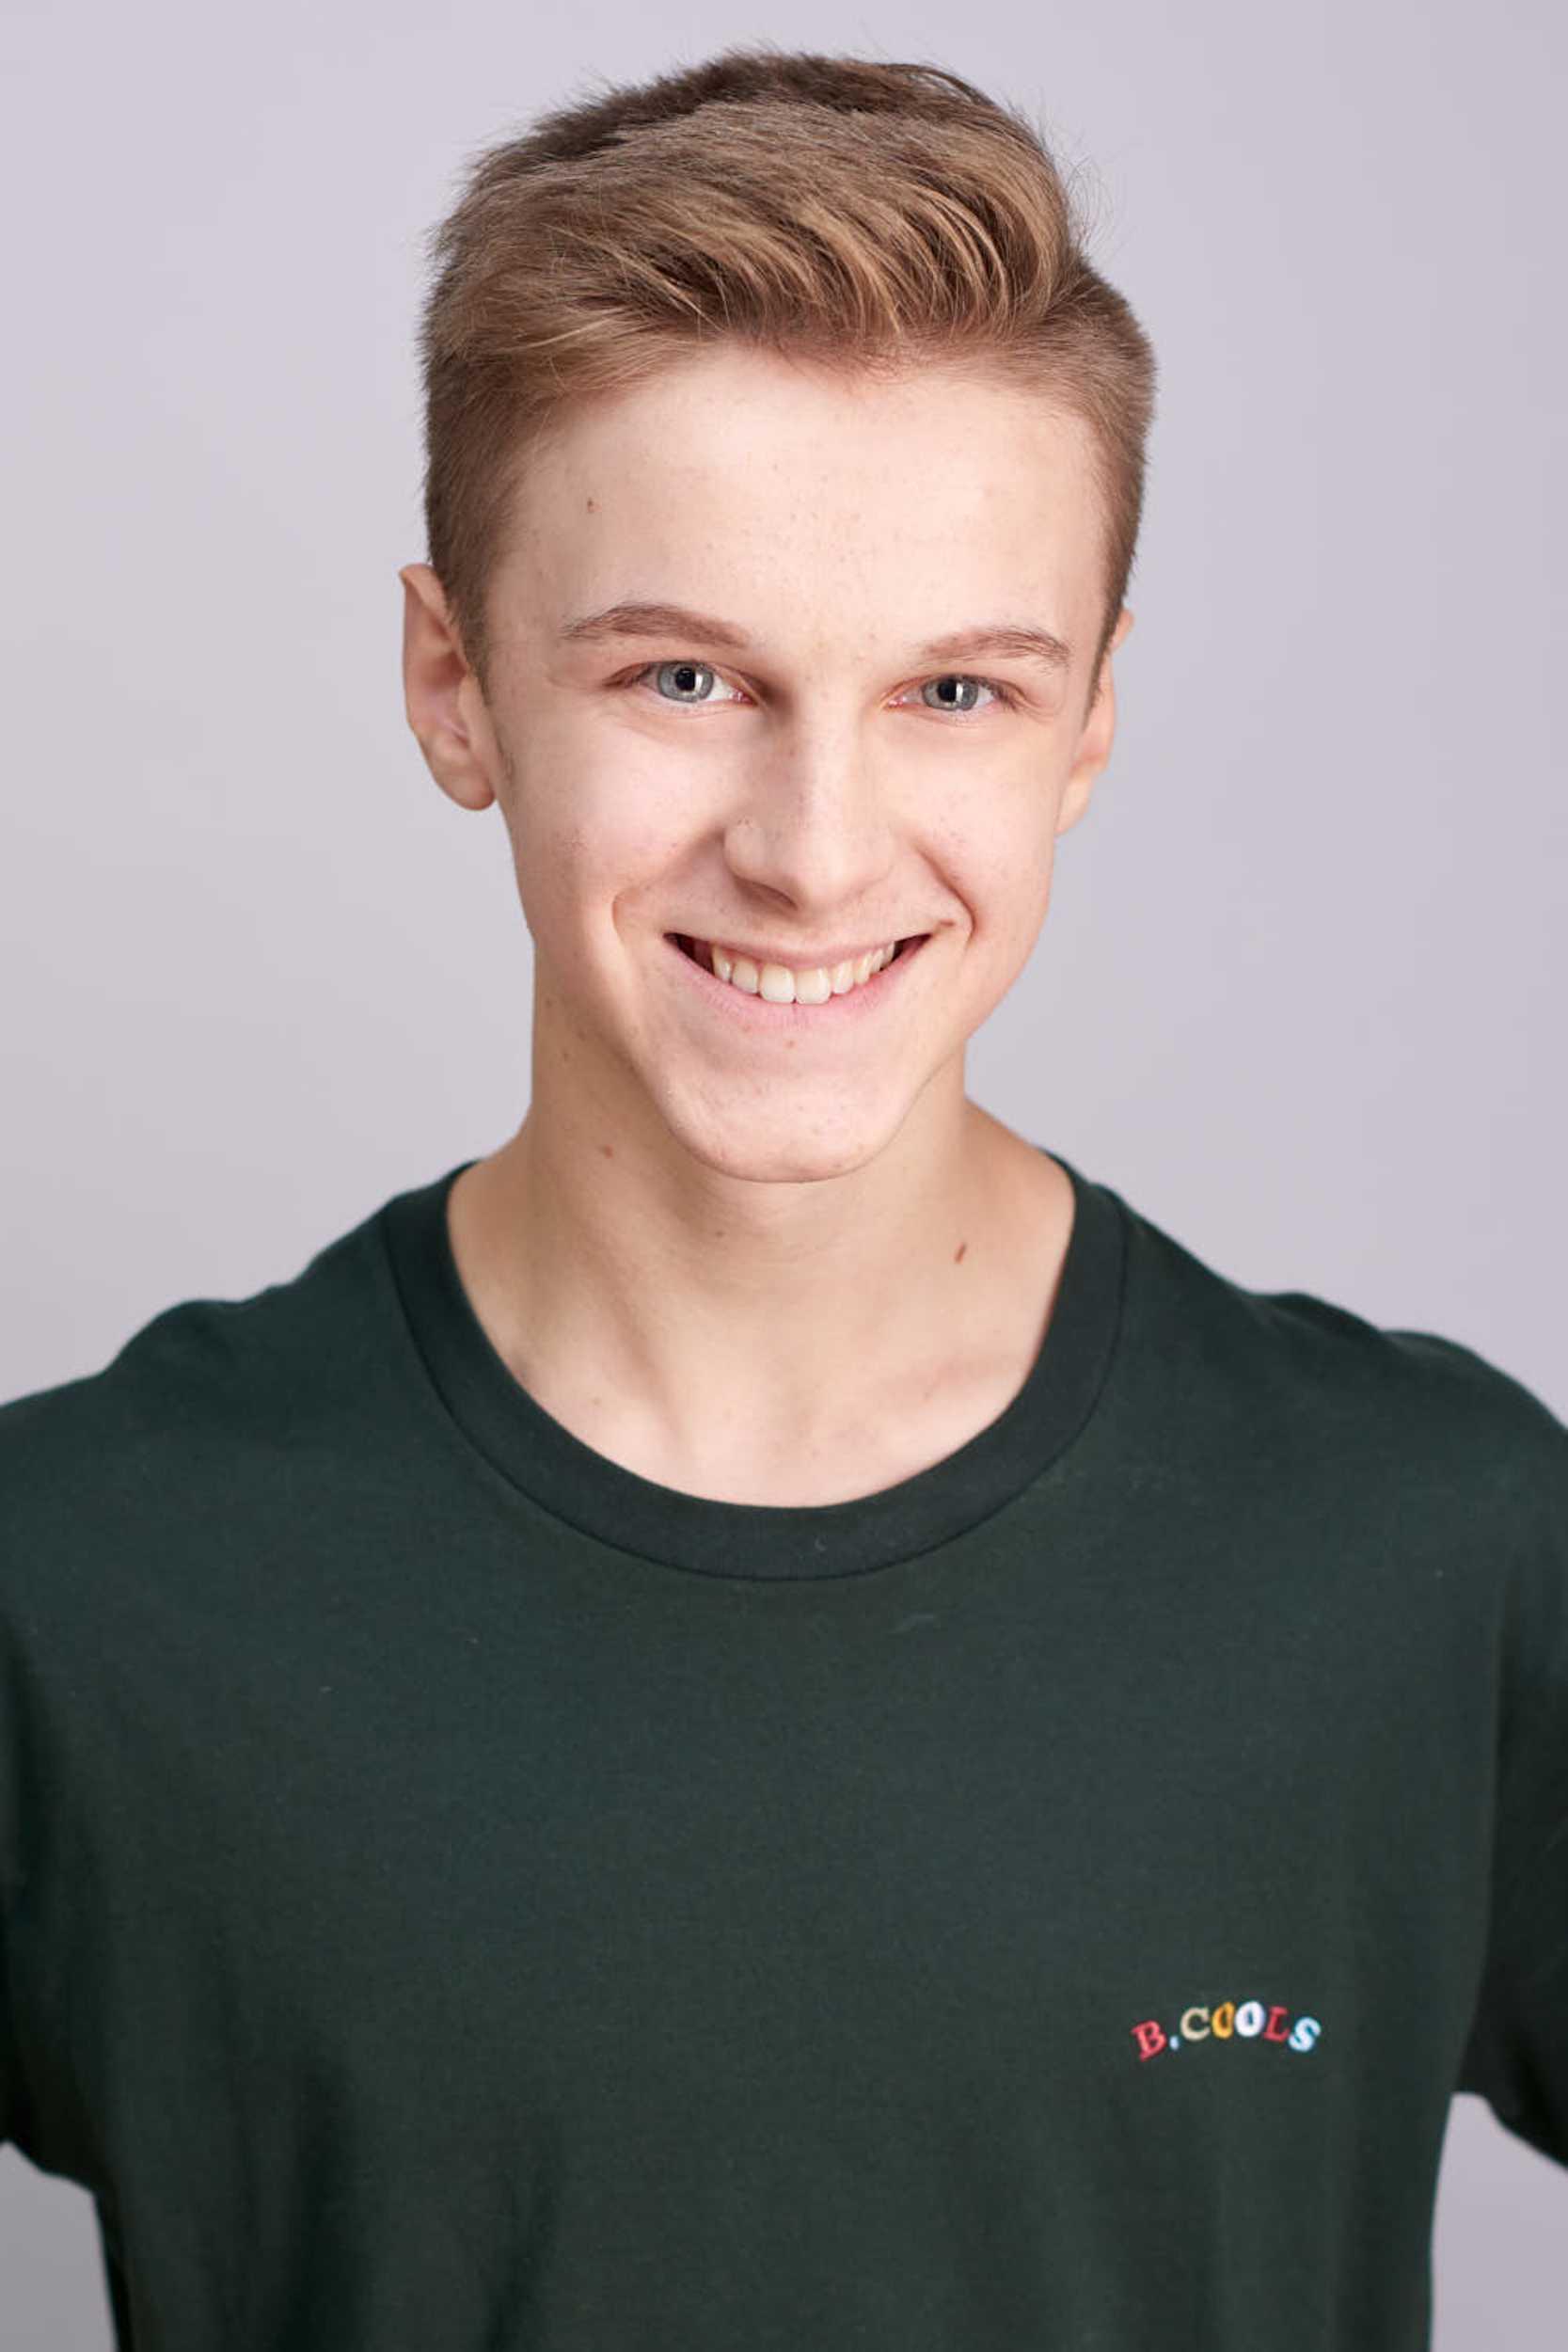 Caleb Waterworth